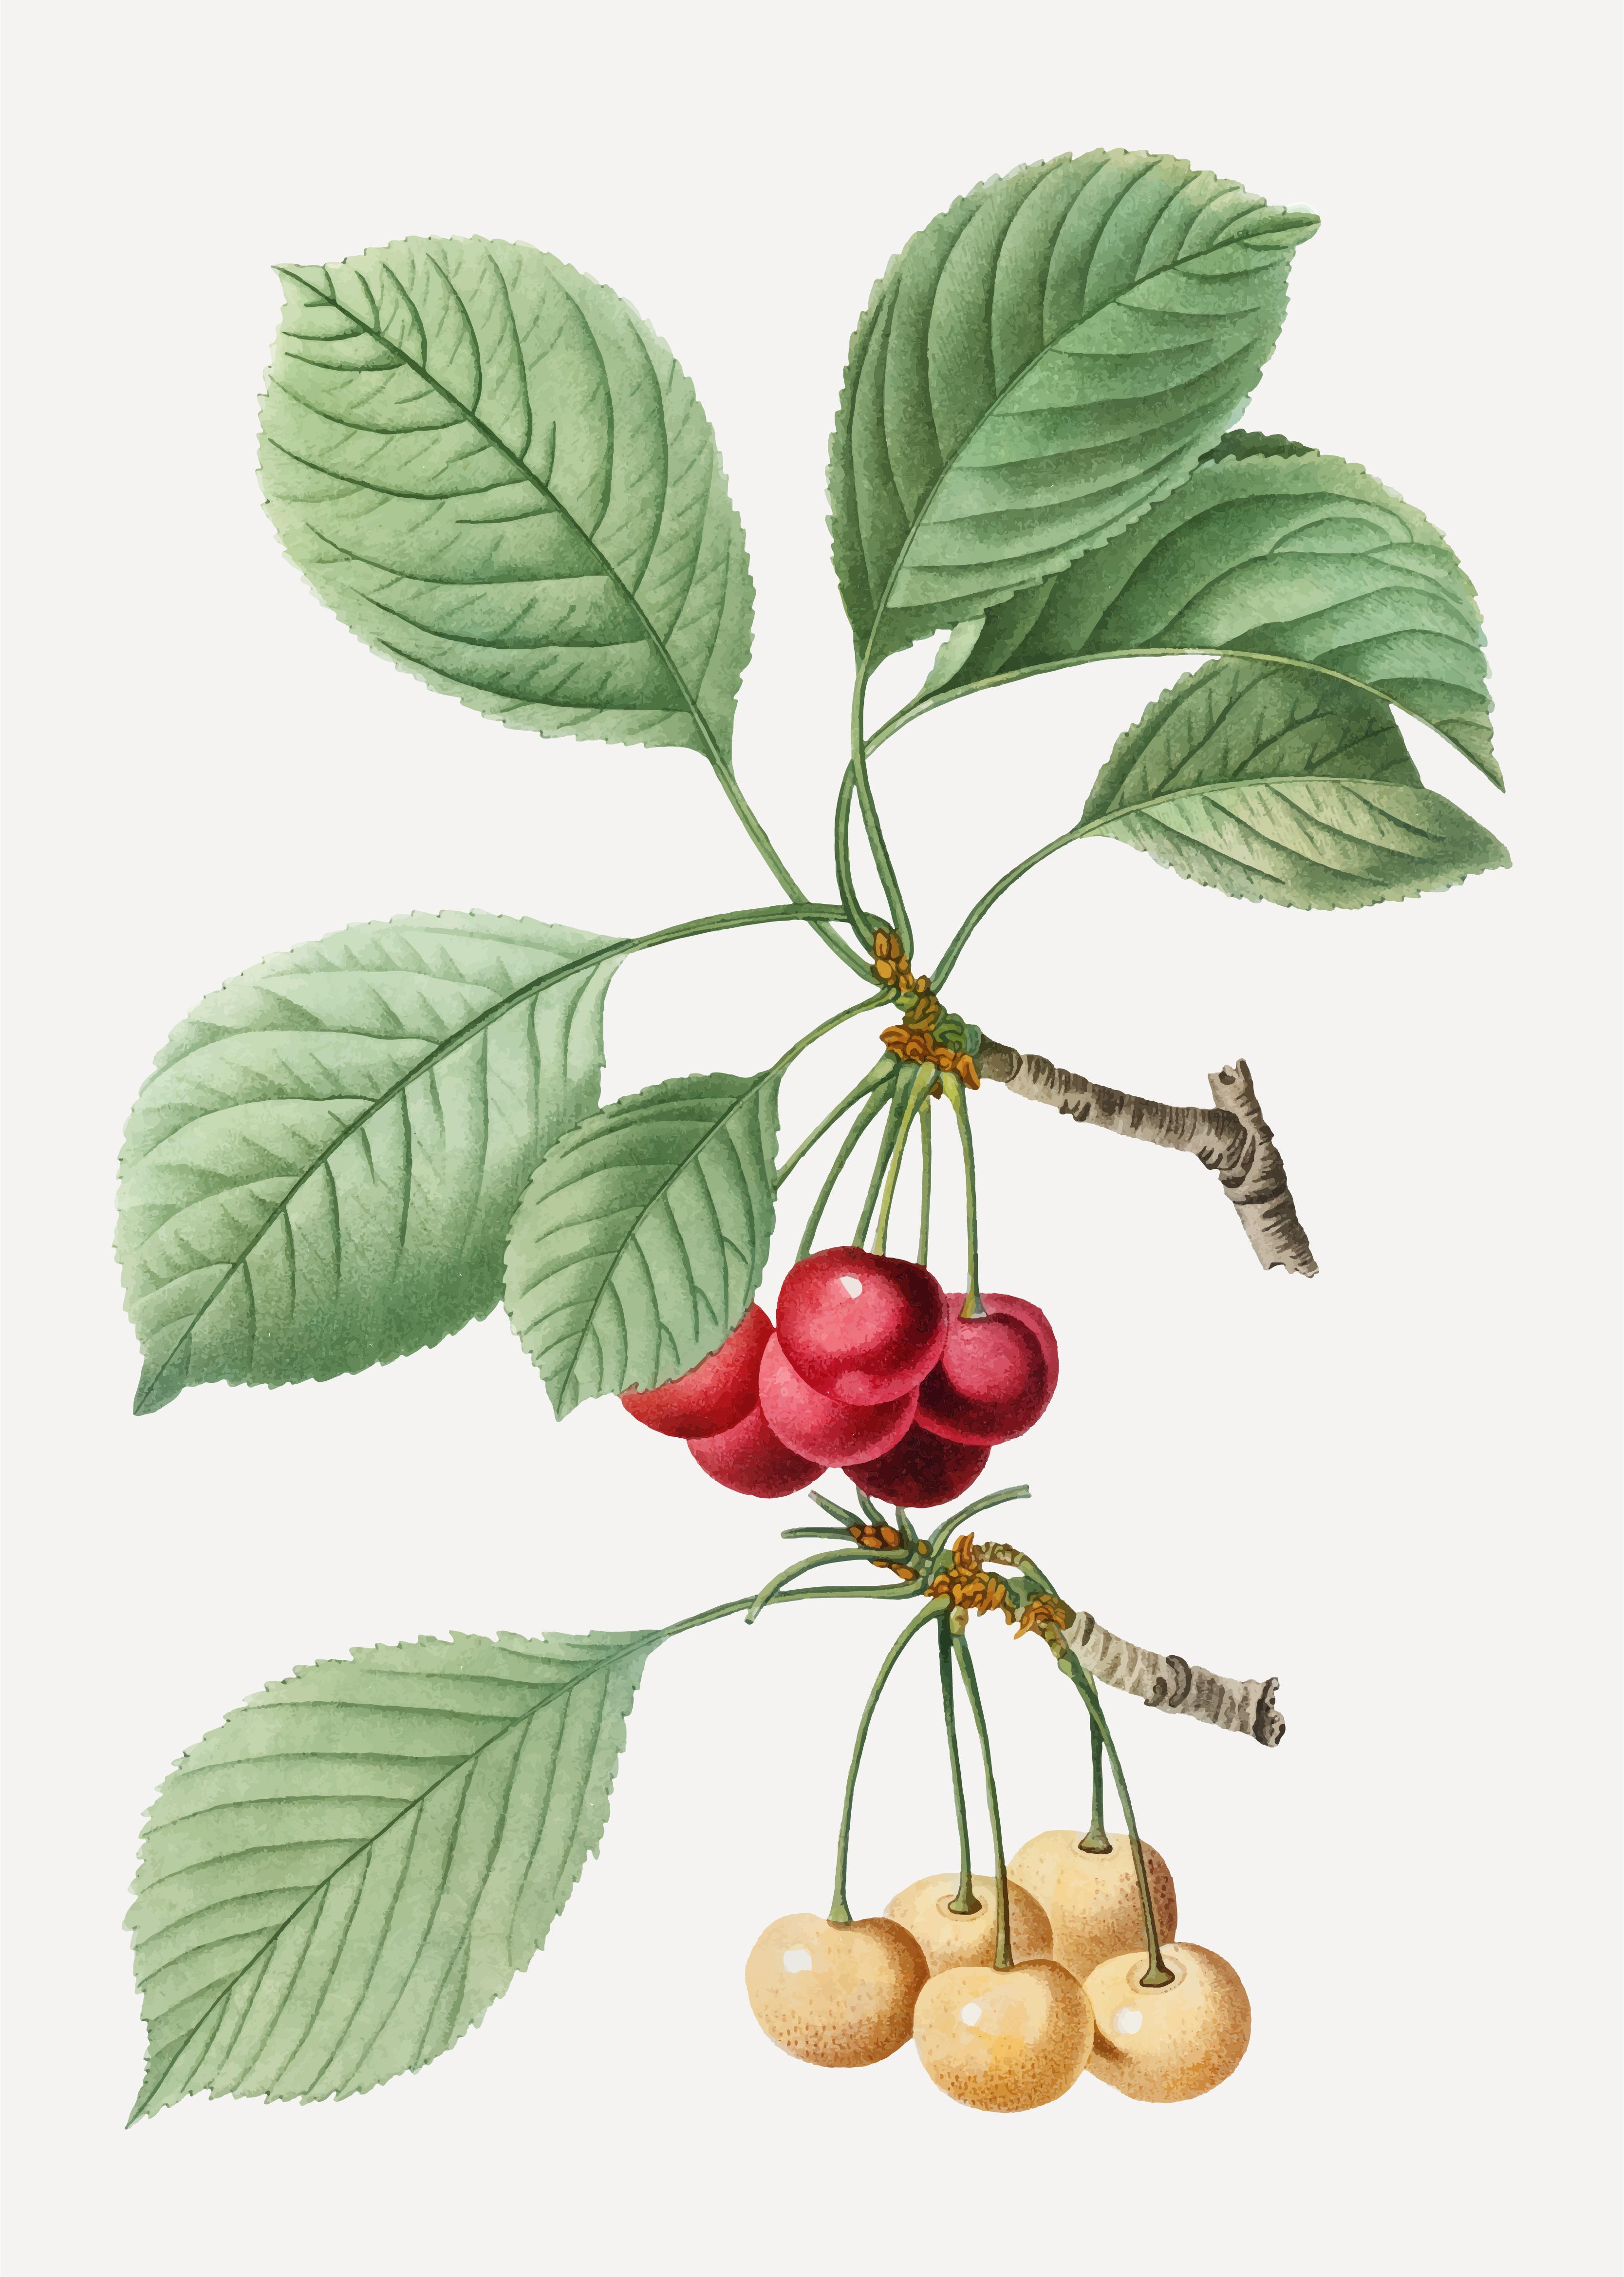 Cherry Tree Branch Download Free Vector Art Stock